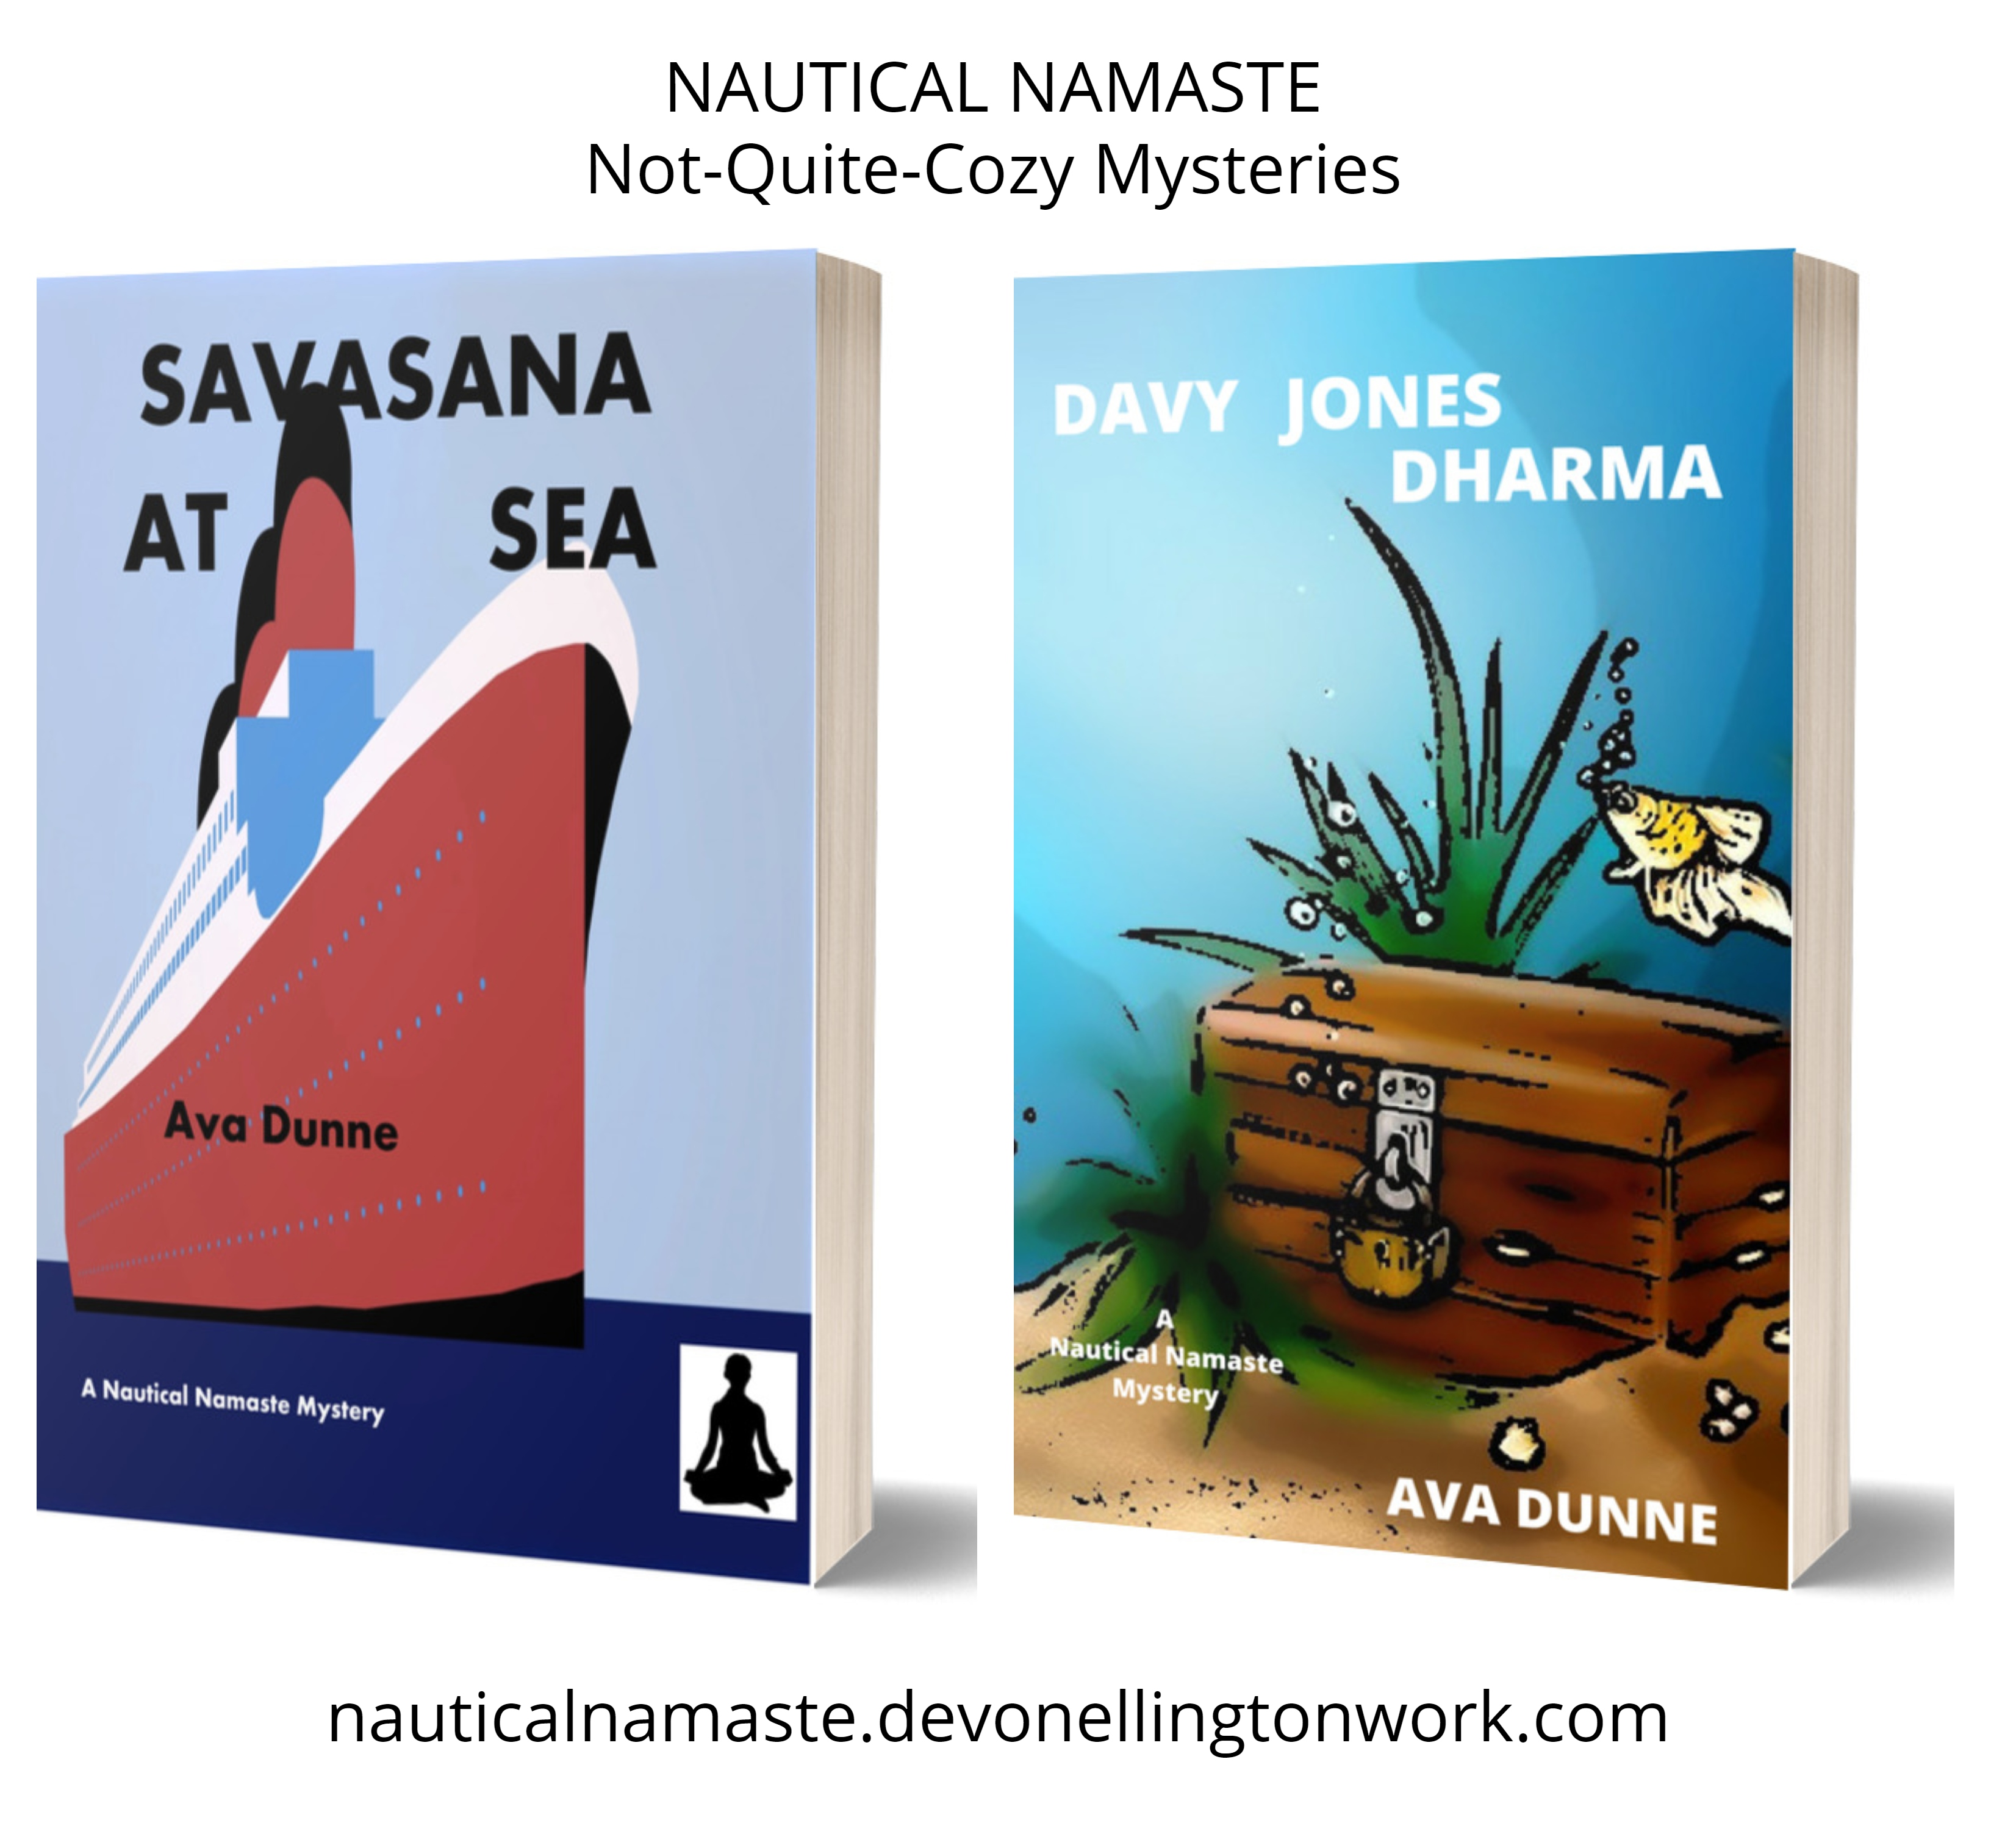 Nautical Namaste 2B 3D Collage